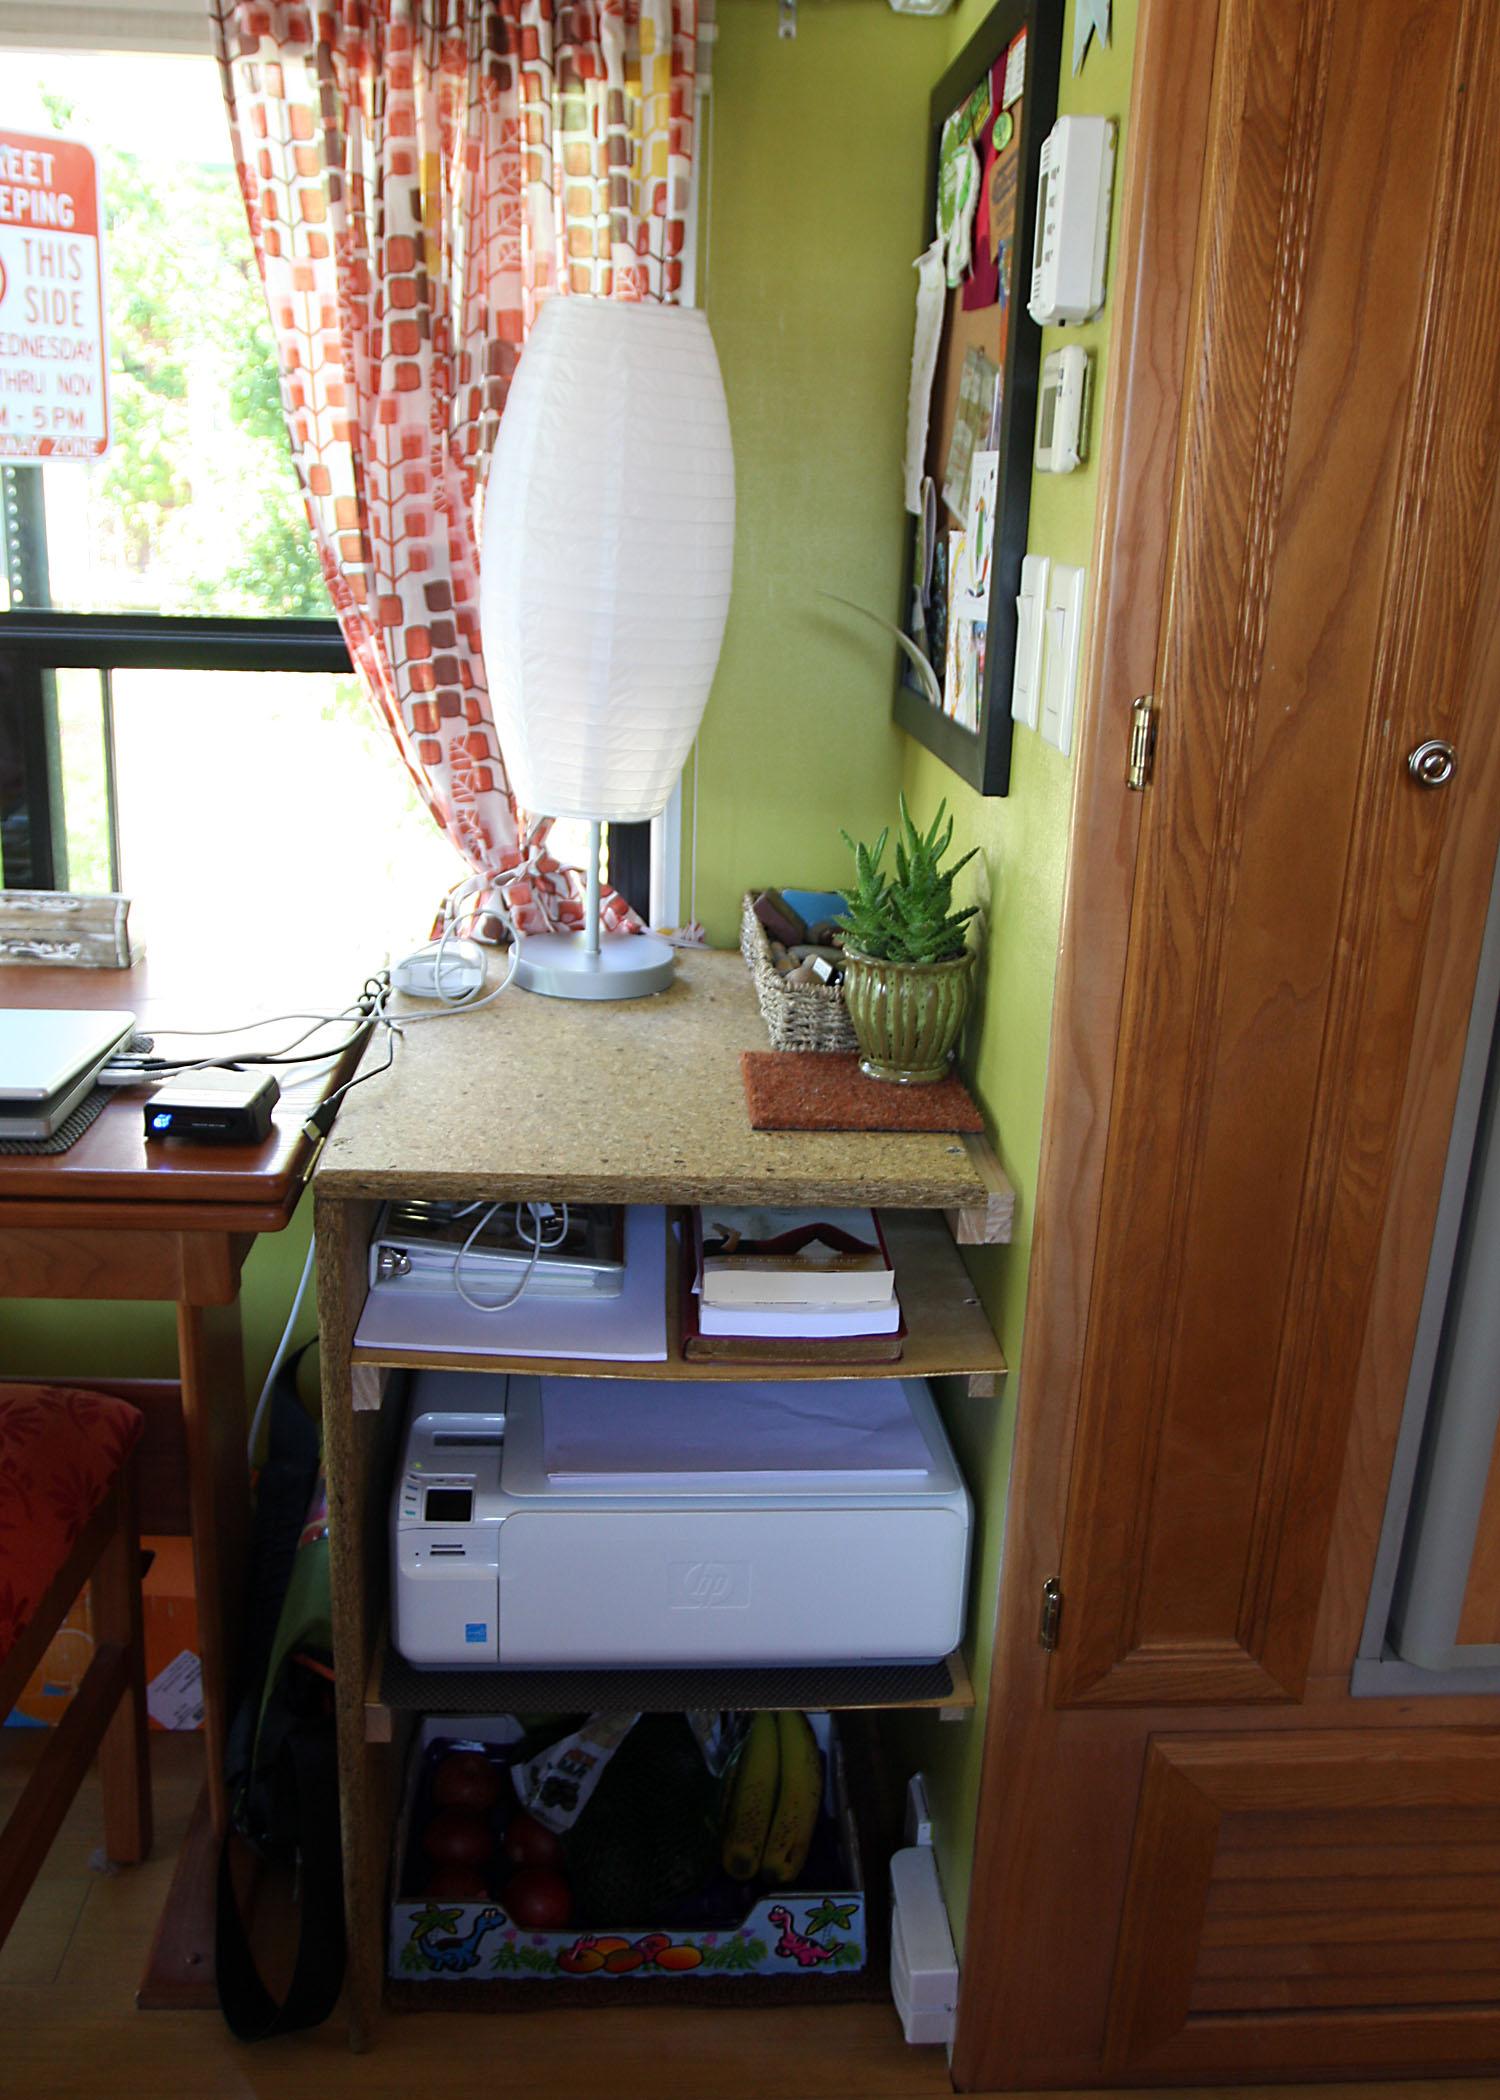 05_Printer and Hard Drive Shelf.jpg